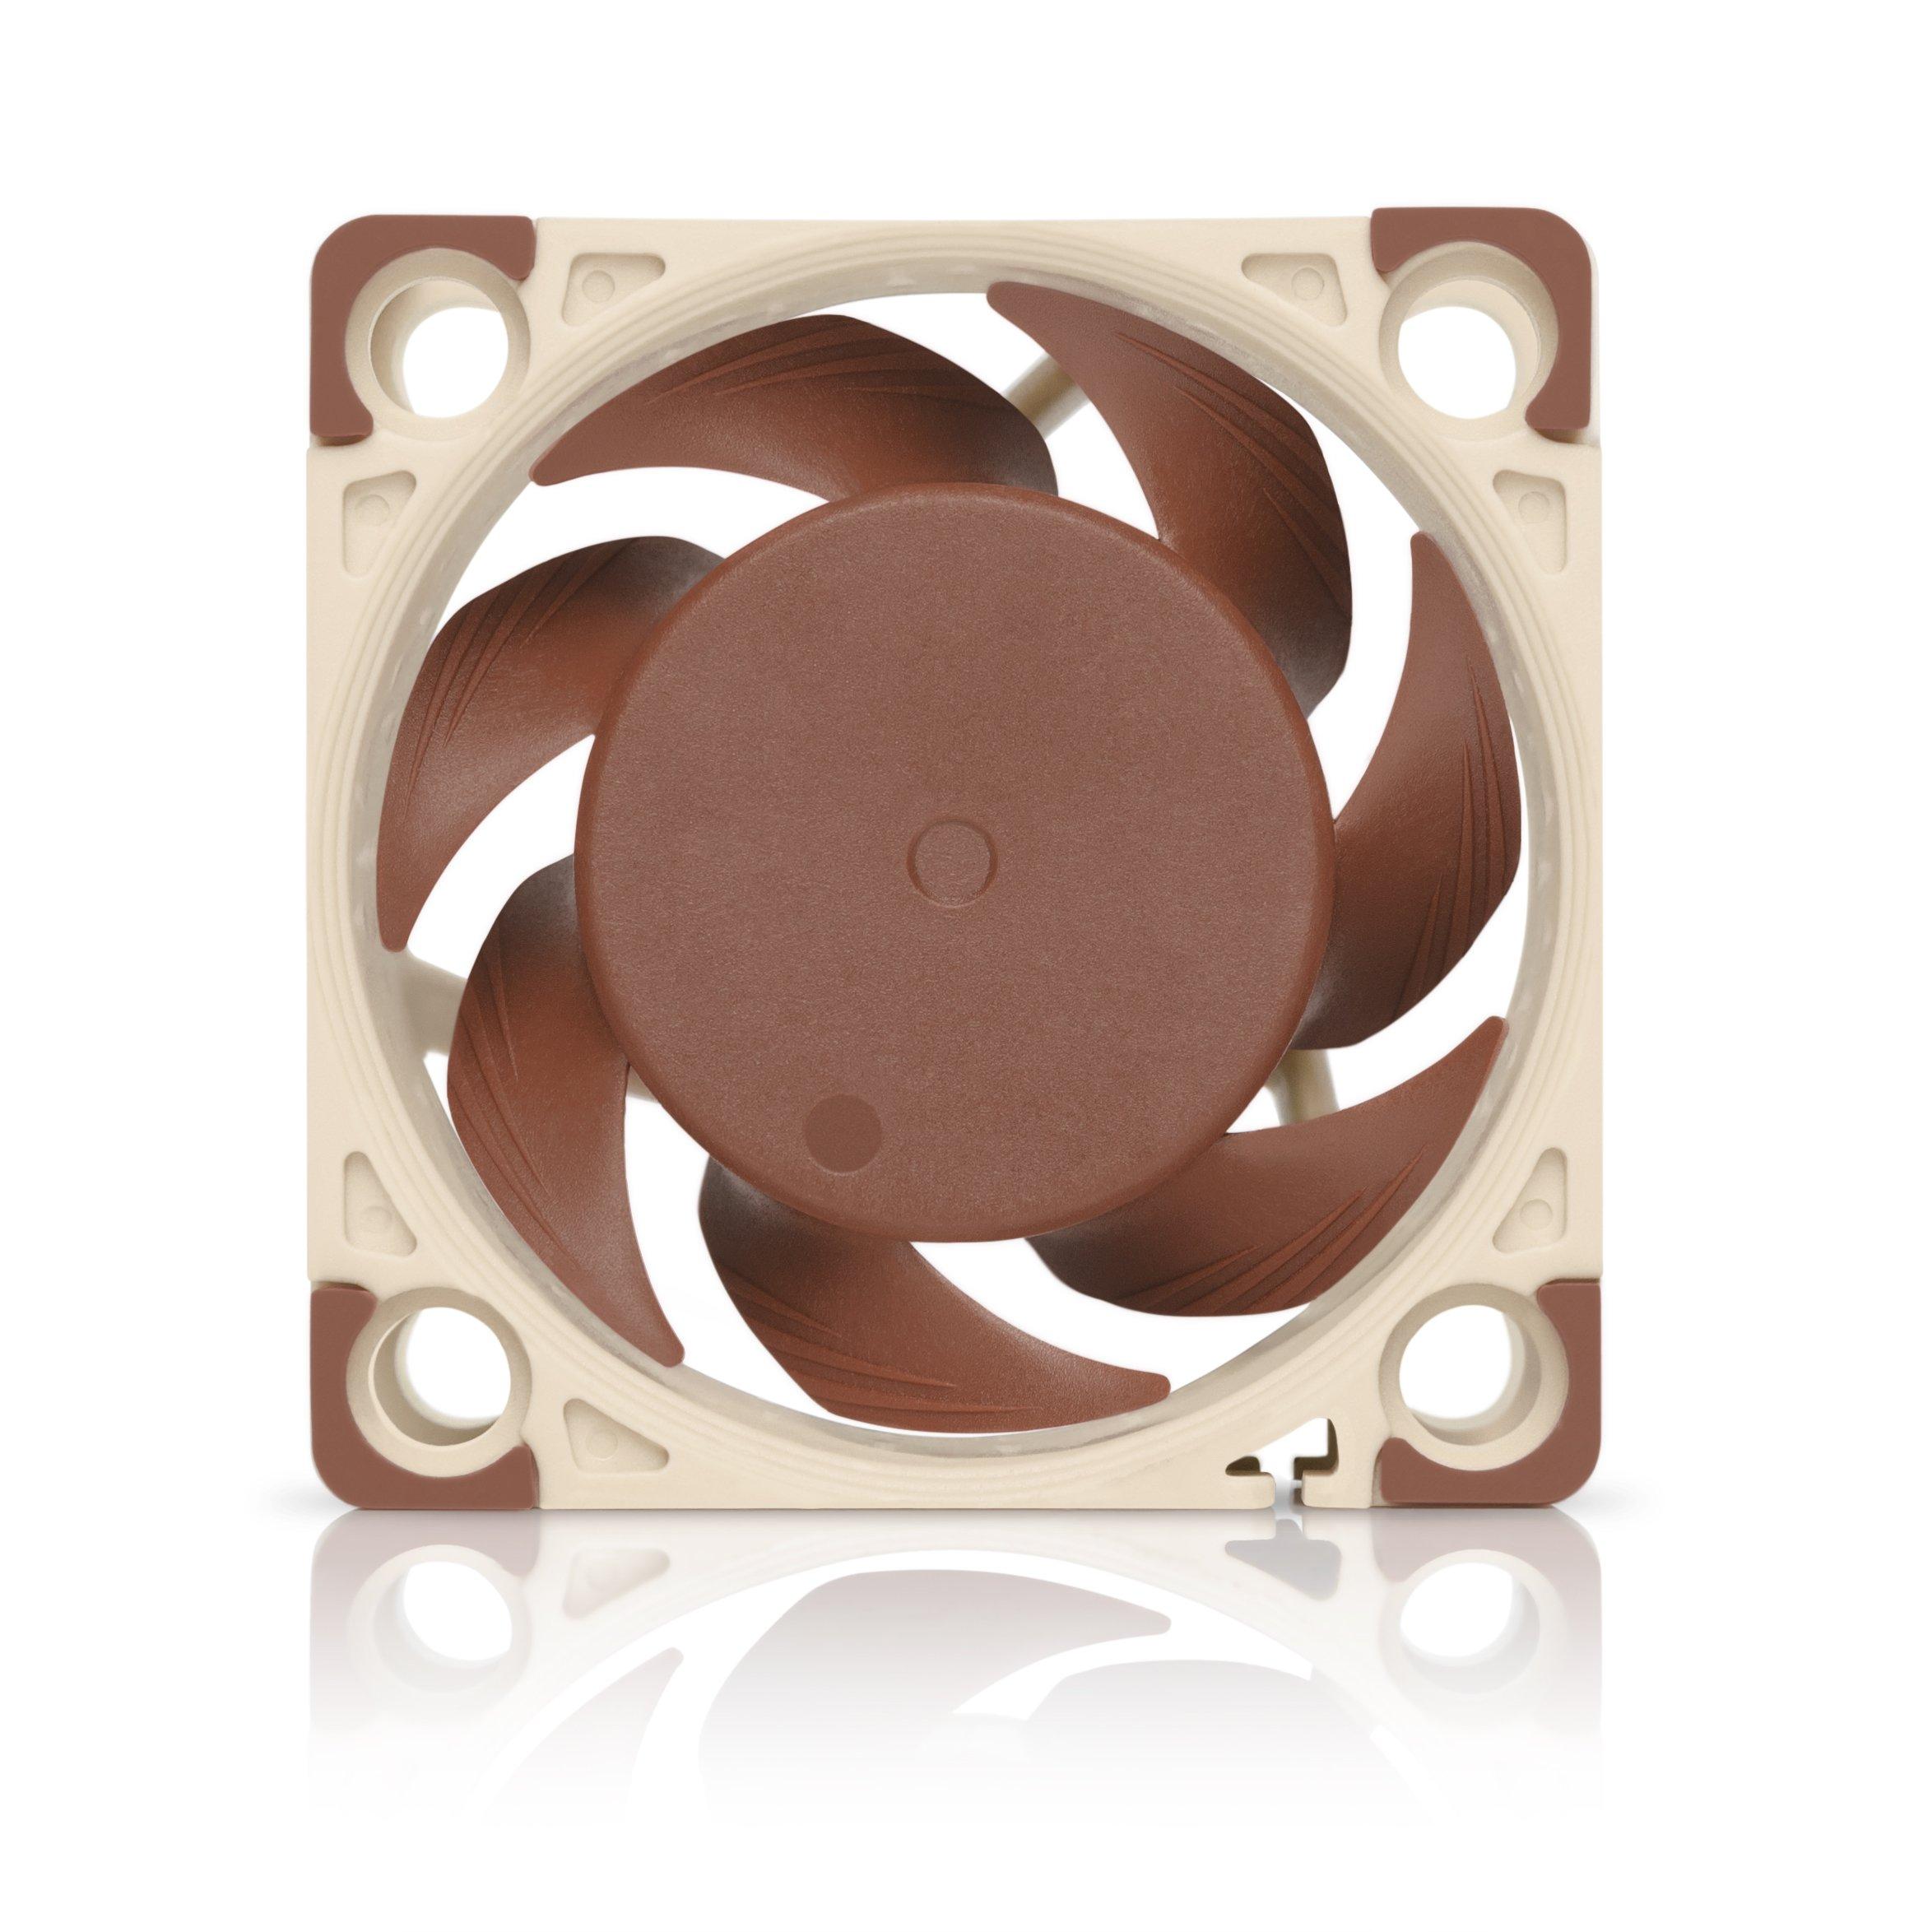 3-Pin Noctua Nf-A4X20 Flx 40X20Mm, Brown Premium Quiet Fan